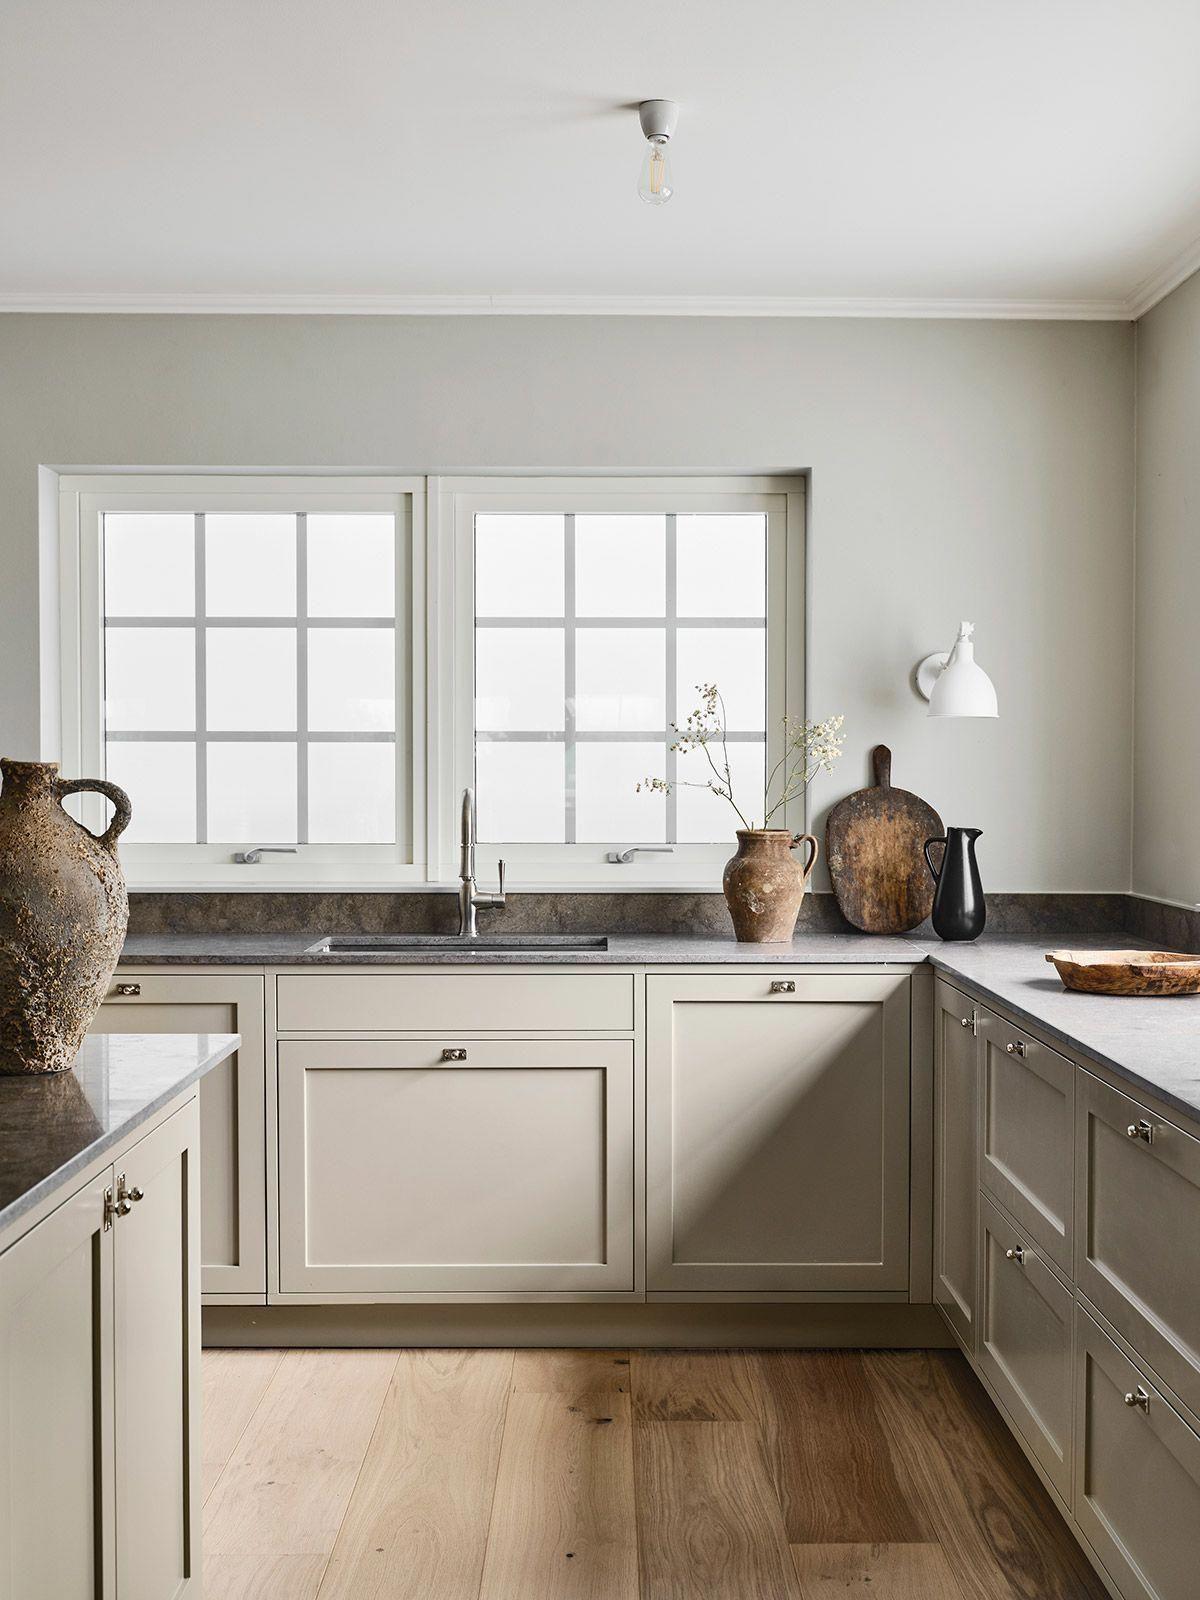 The Nordic kitchen by Nordiska Kök